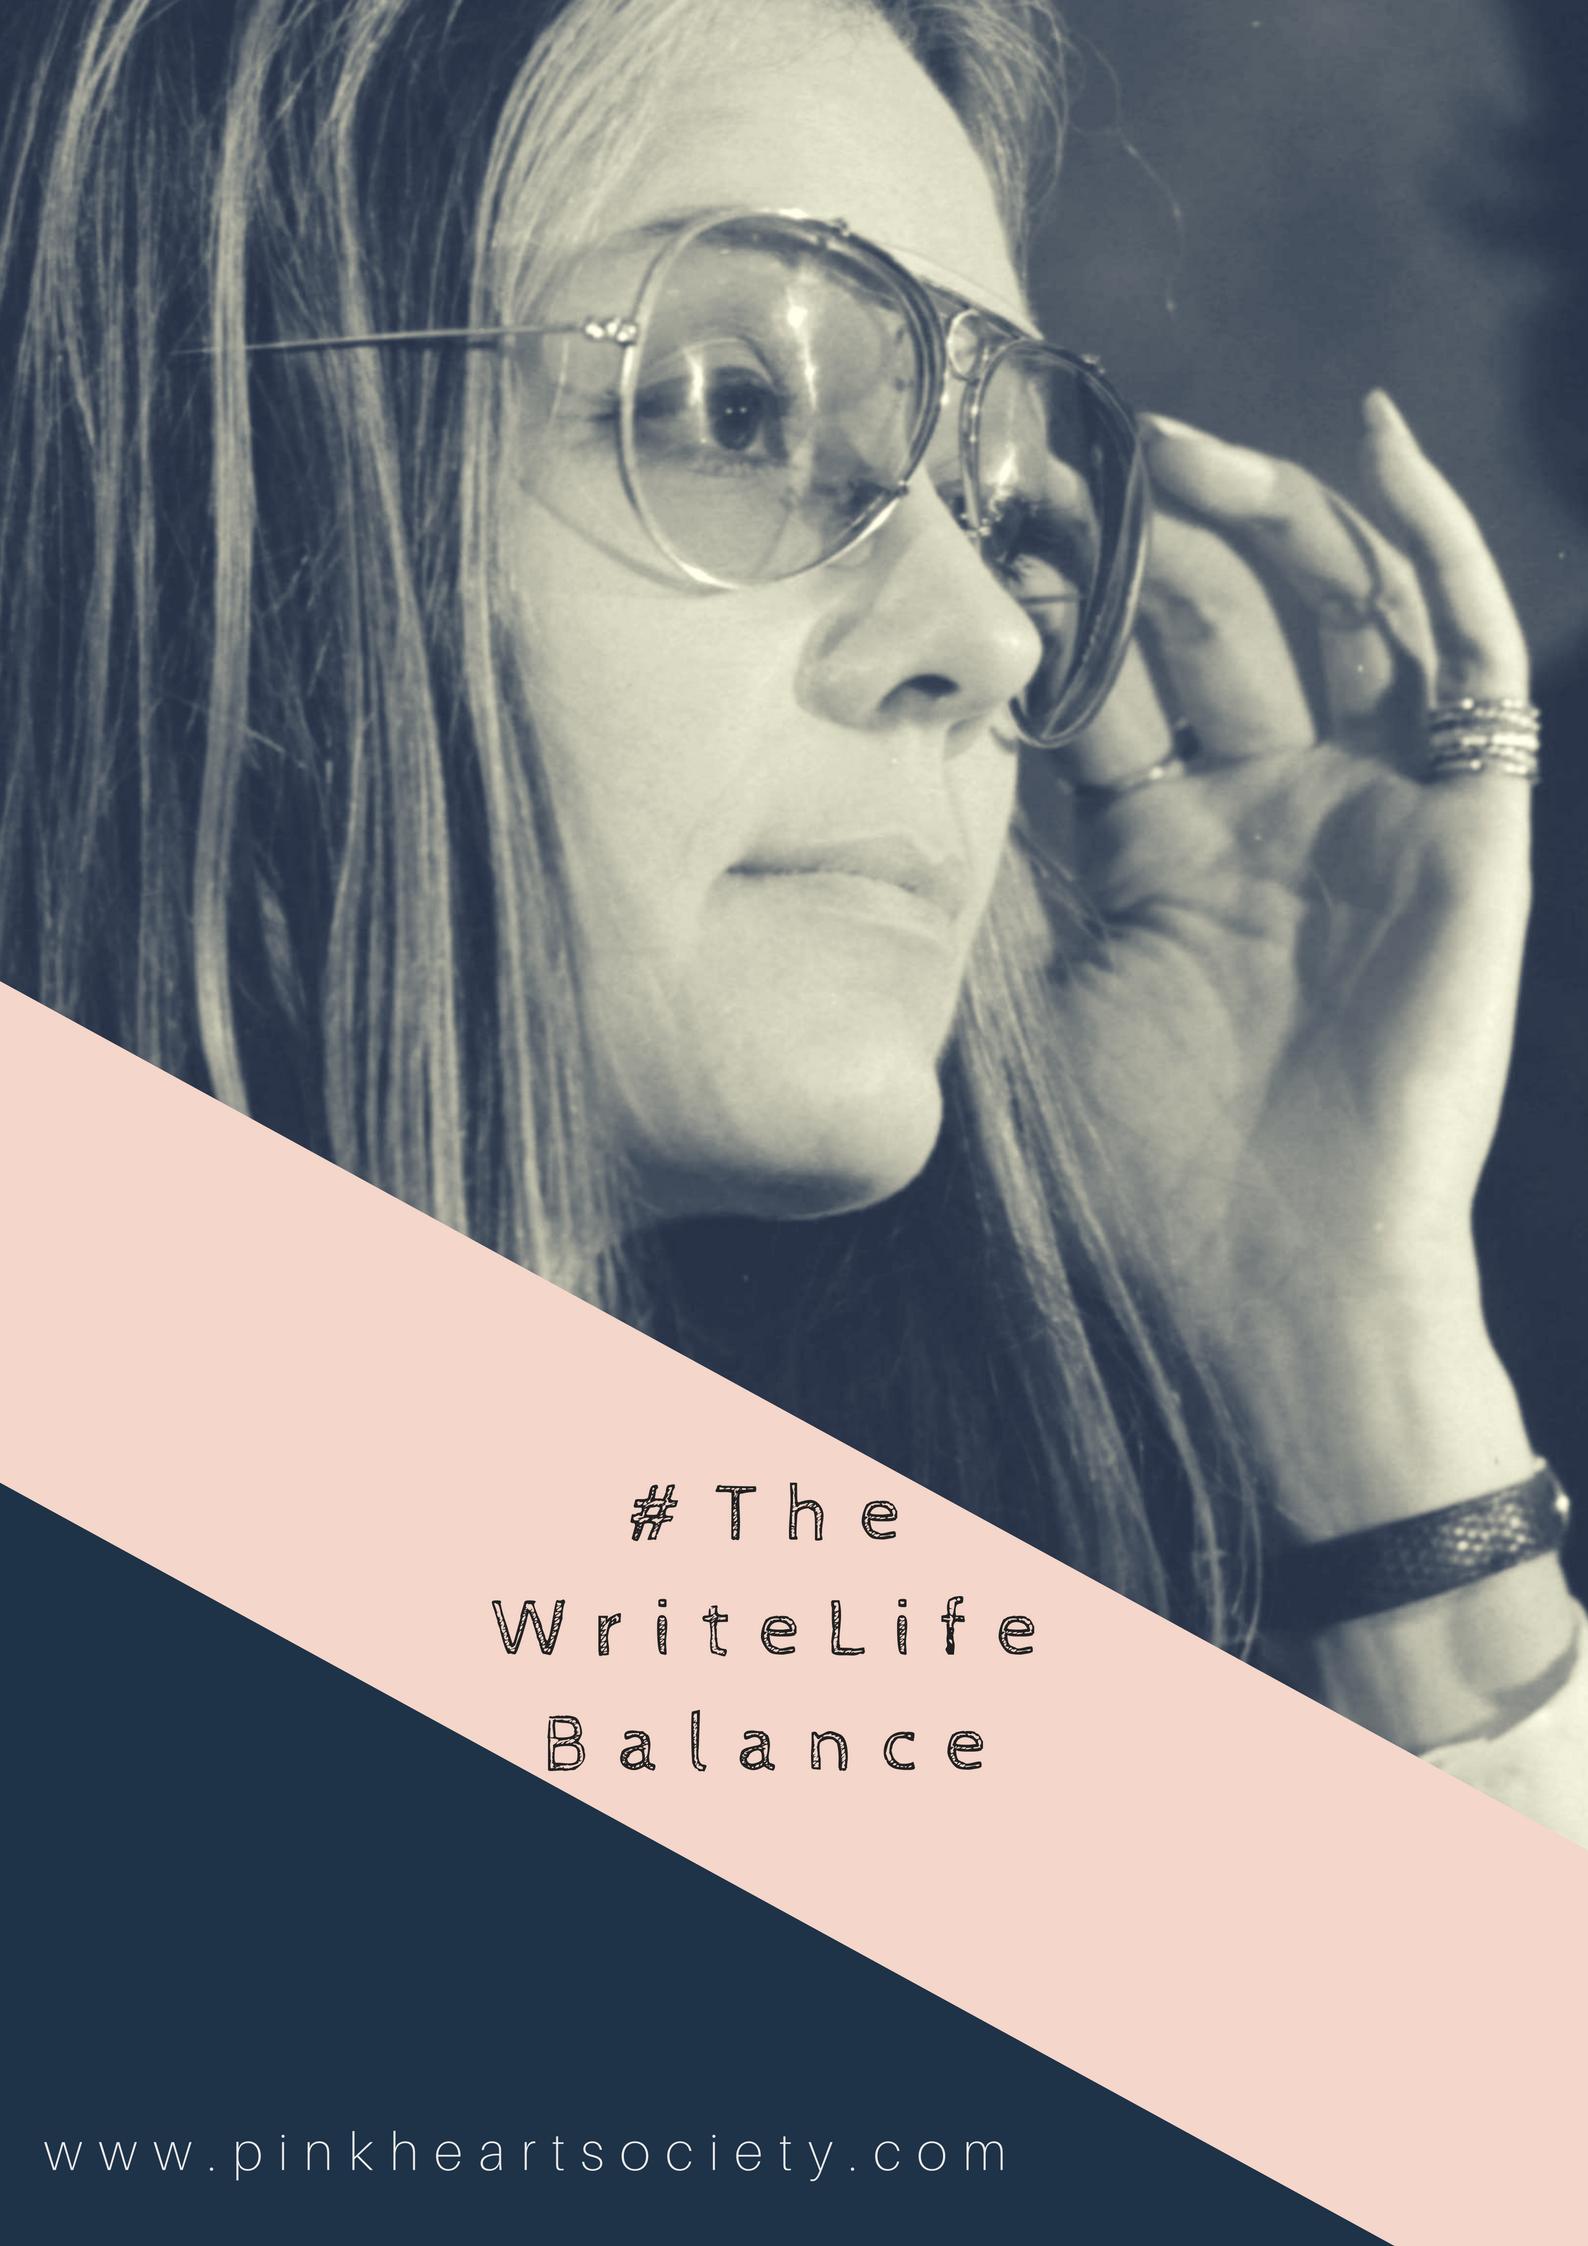 #TheWriteLifeBalance